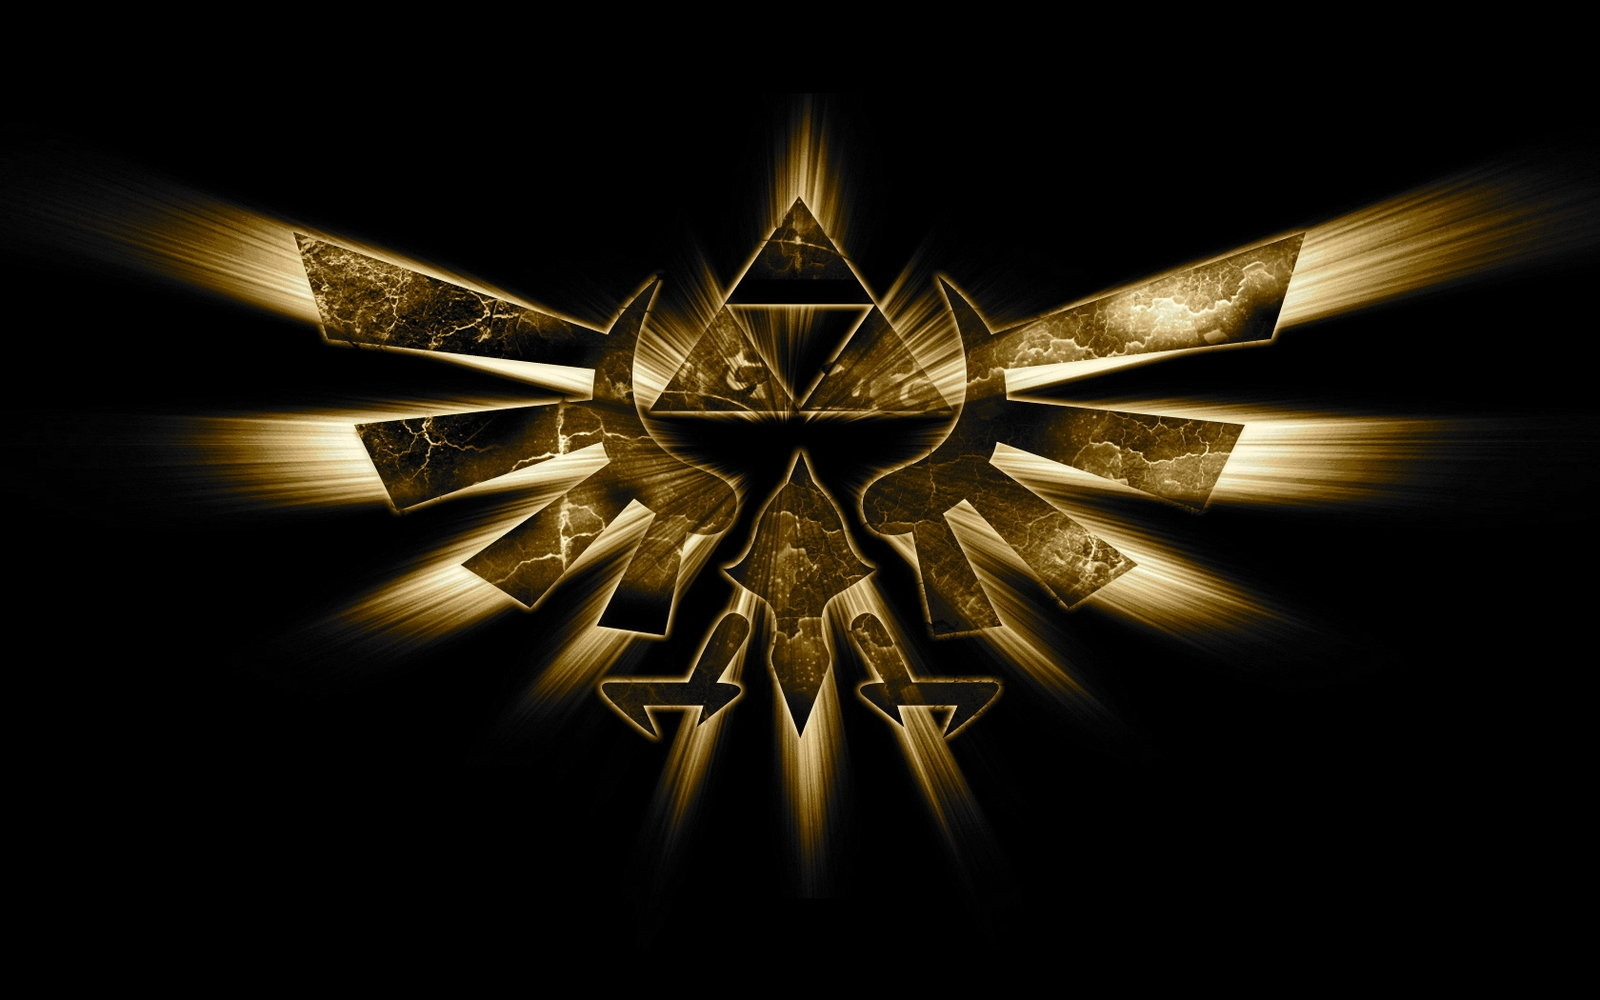 Free-desktop-background-album-Download-Color-Changing-Zelda-Desktop-Background-Album-On-Imgur-in-wallpaper-wp3605821